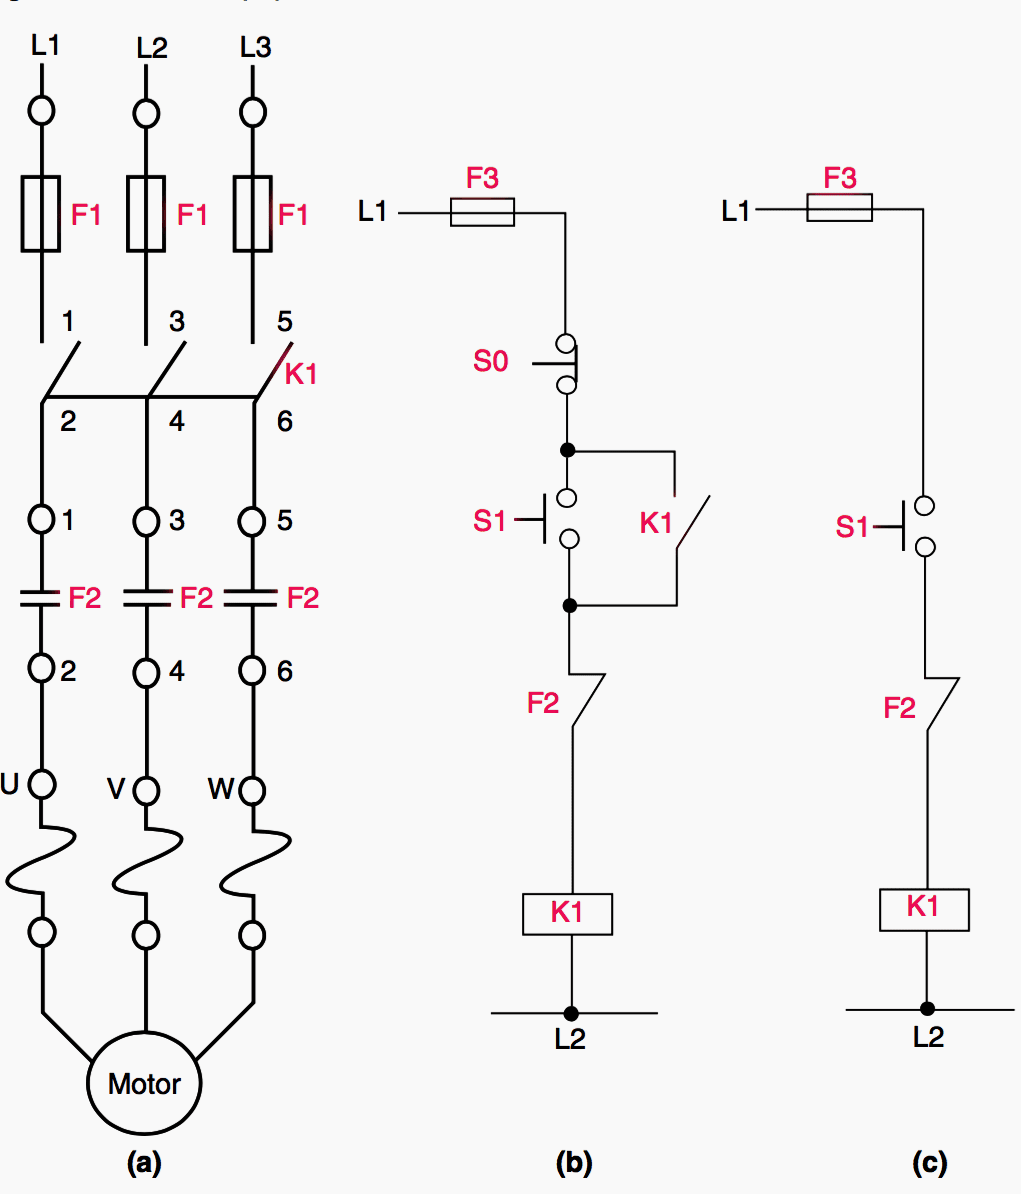 Powerflex 755 Control Block Diagram Electrical Wiring Diagrams 753 Rockwell Vfd Schematic System